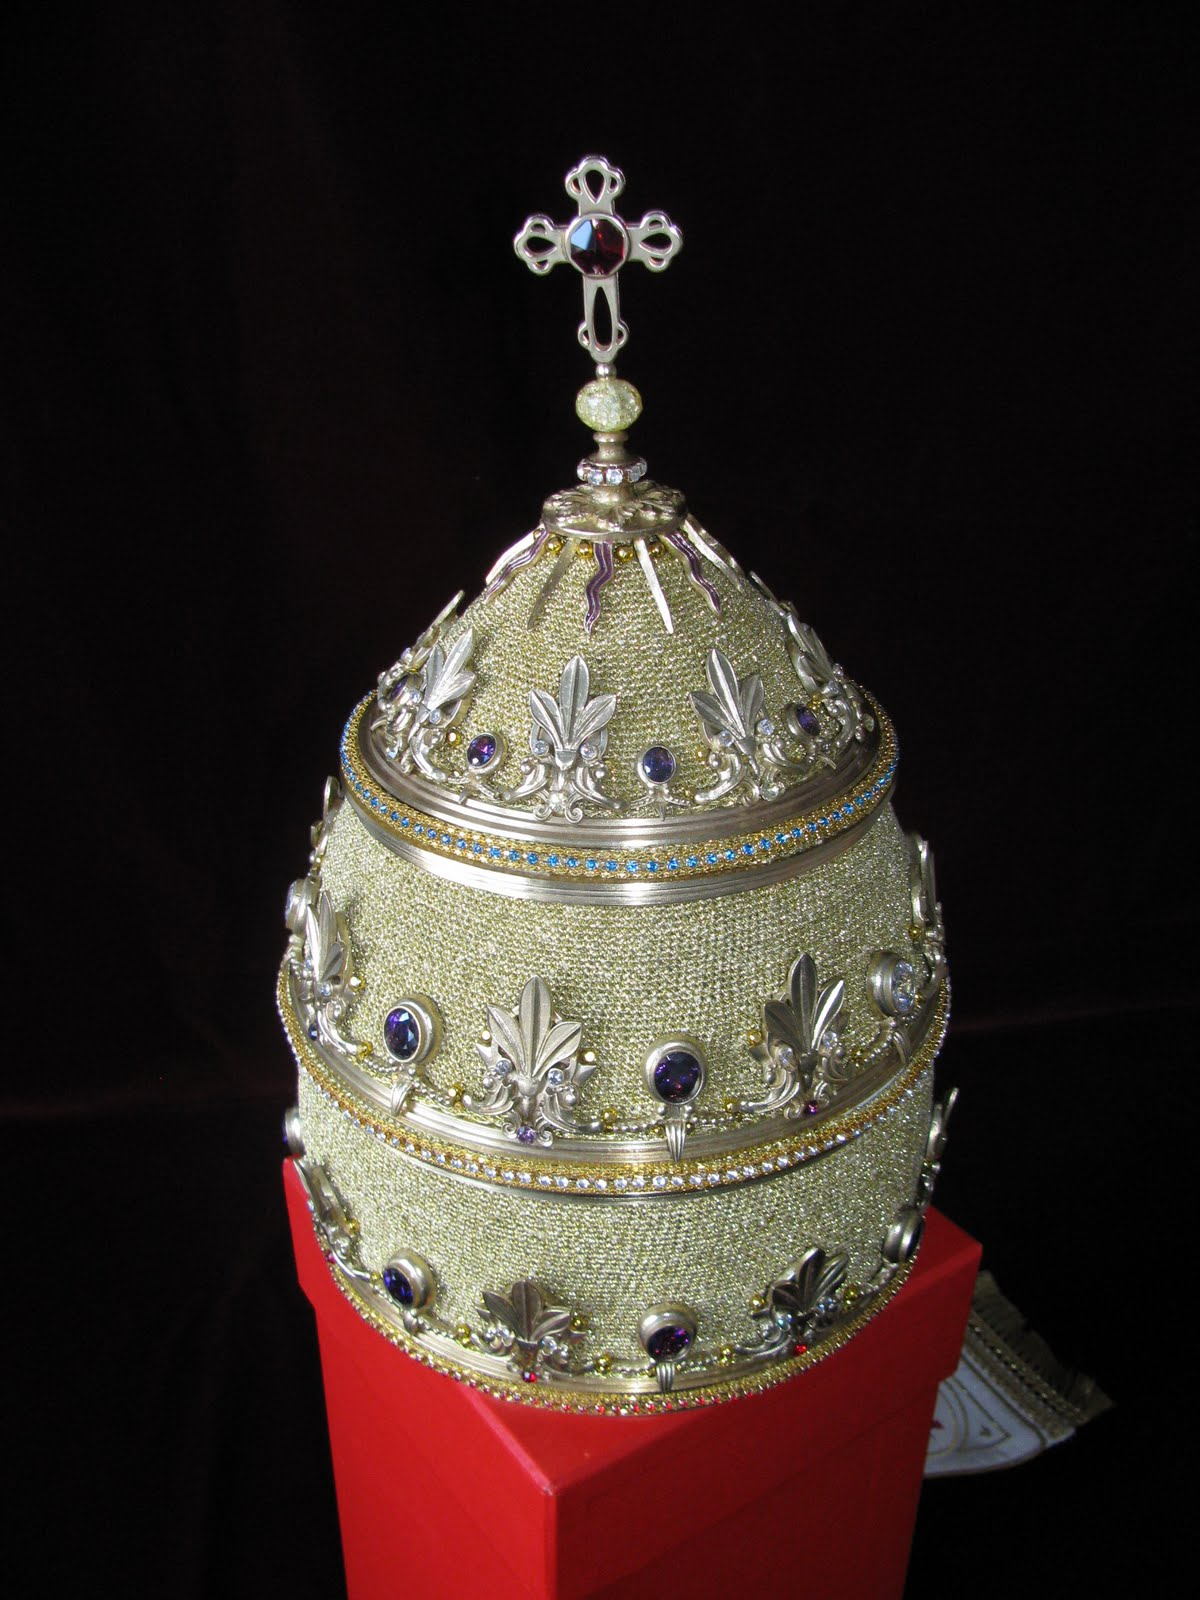 Orbis Catholicus Secundus: The New Papal Tiara